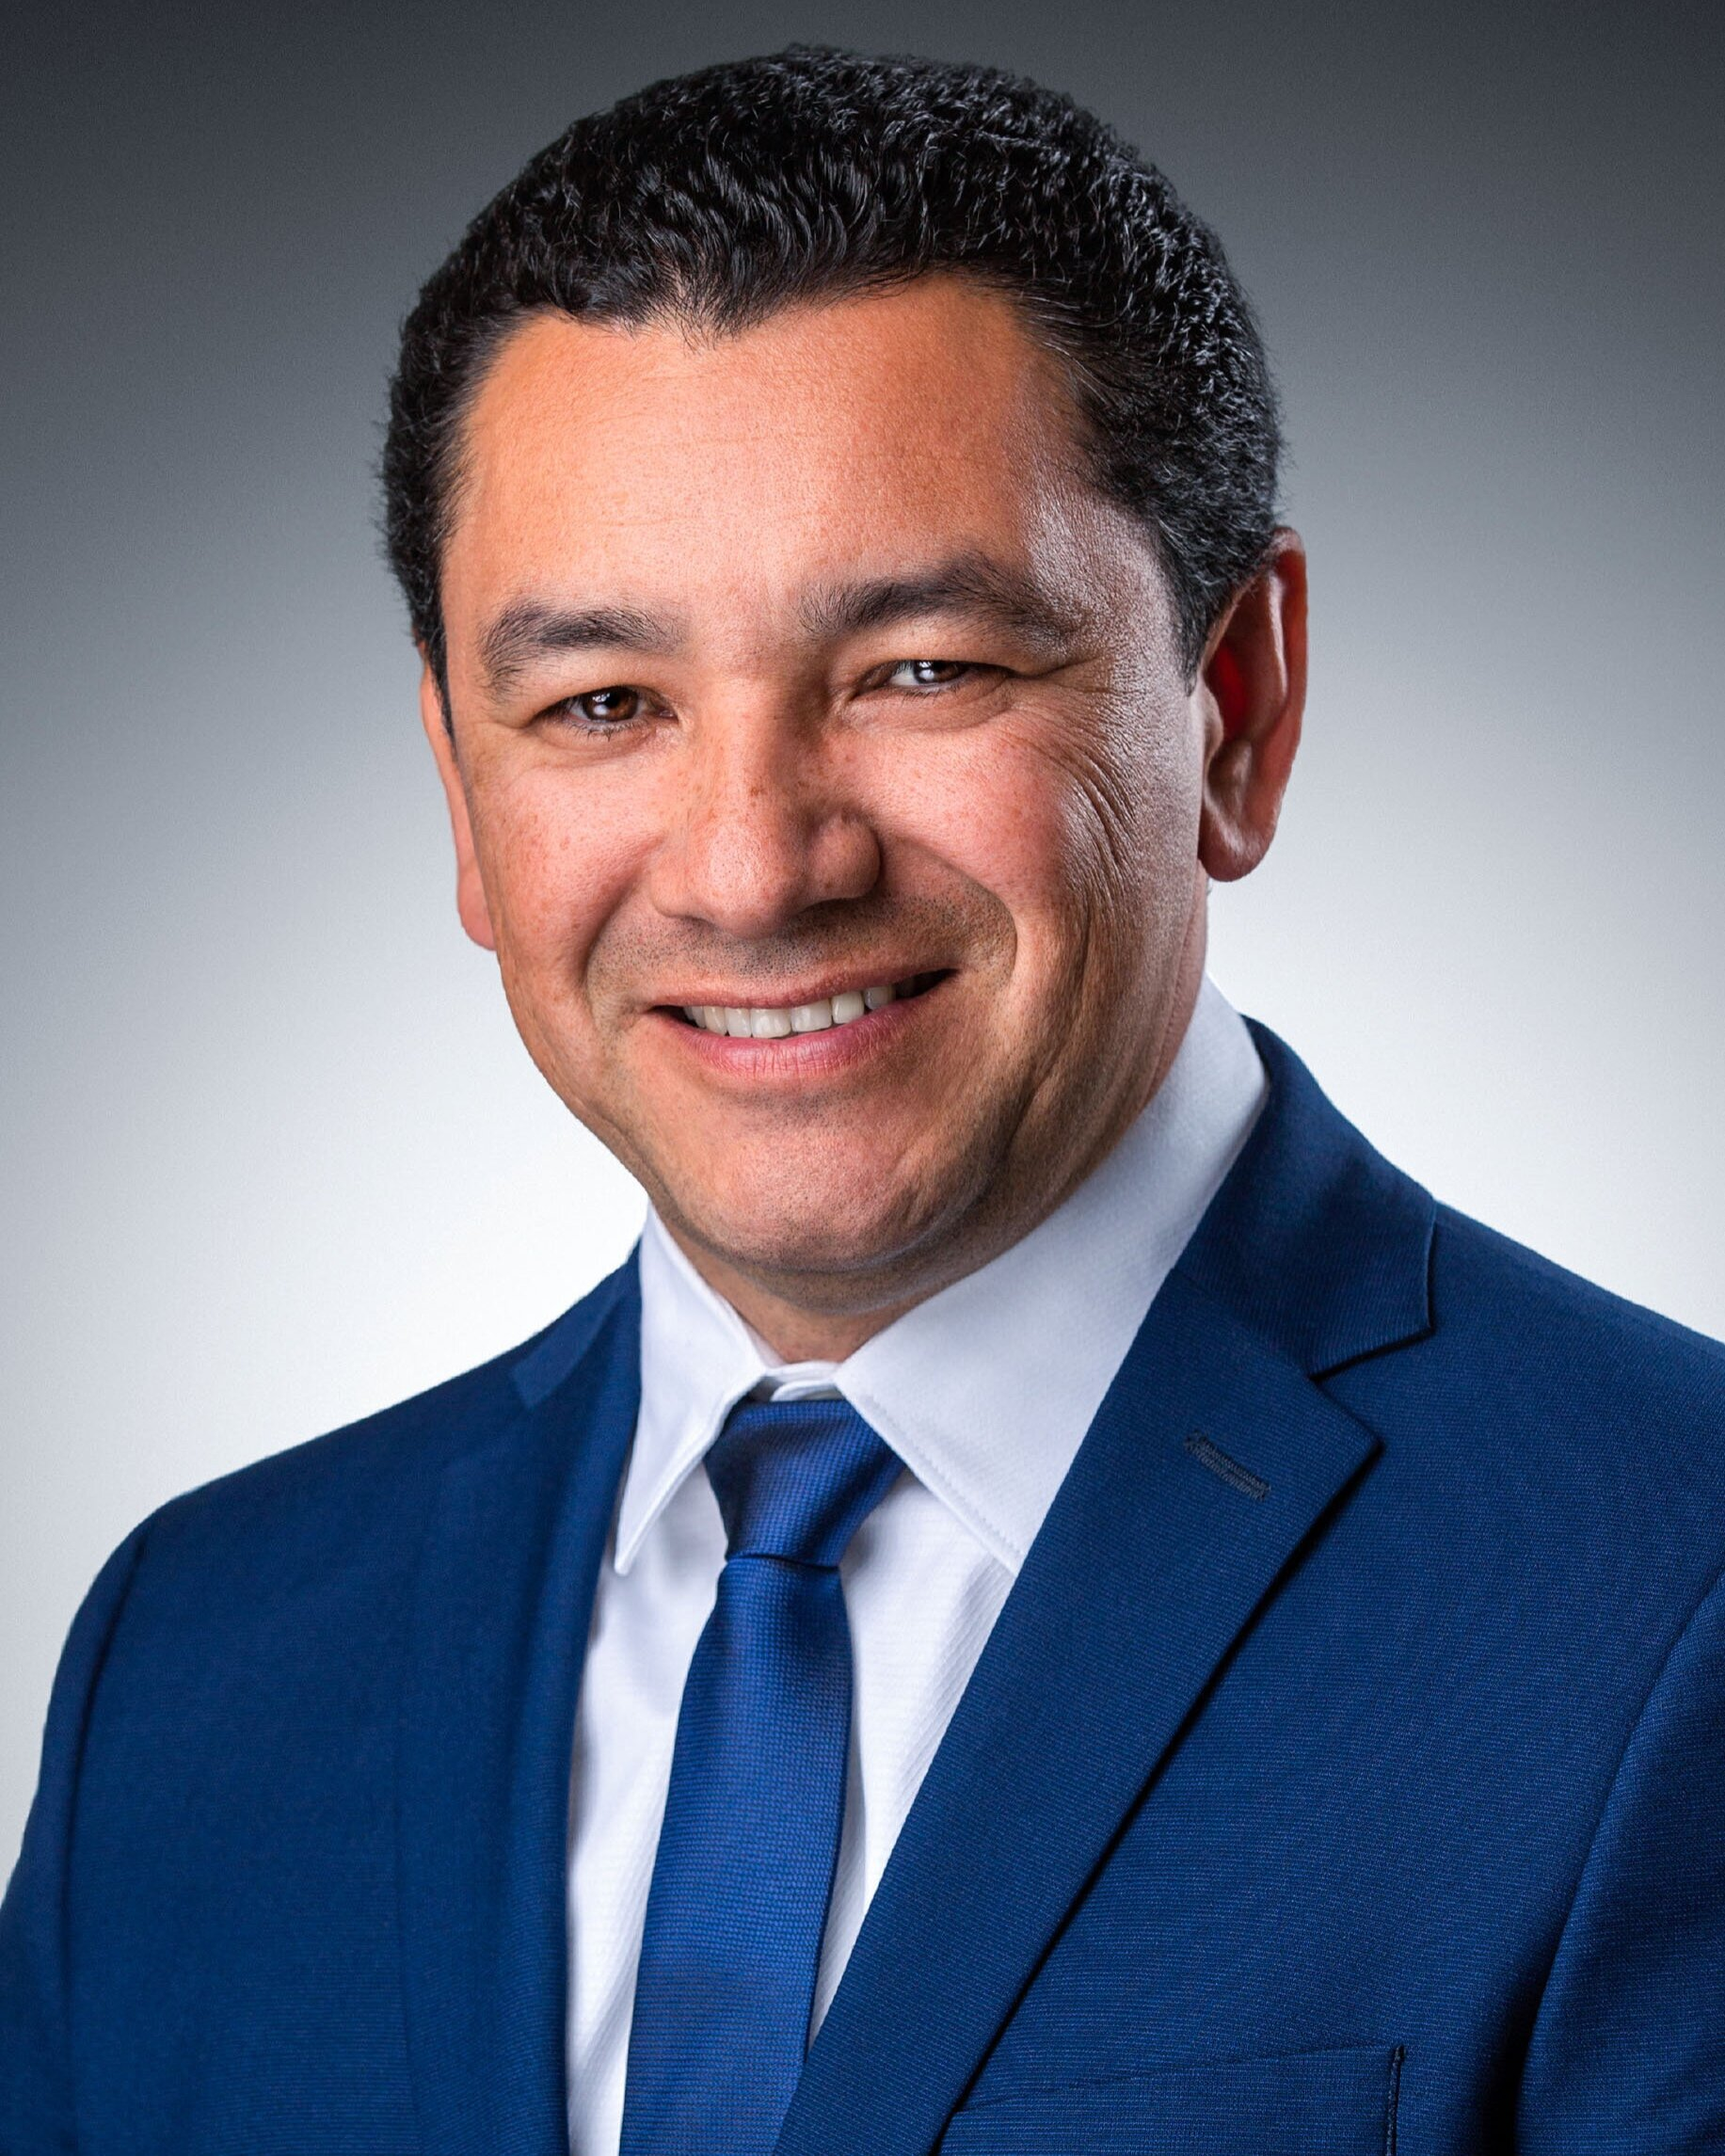 Juan A.Salgado - Department ManagerSystems Engineering Integration and TestNorthrop Grumman Mission SystemsNorthrop Grumman Corporation